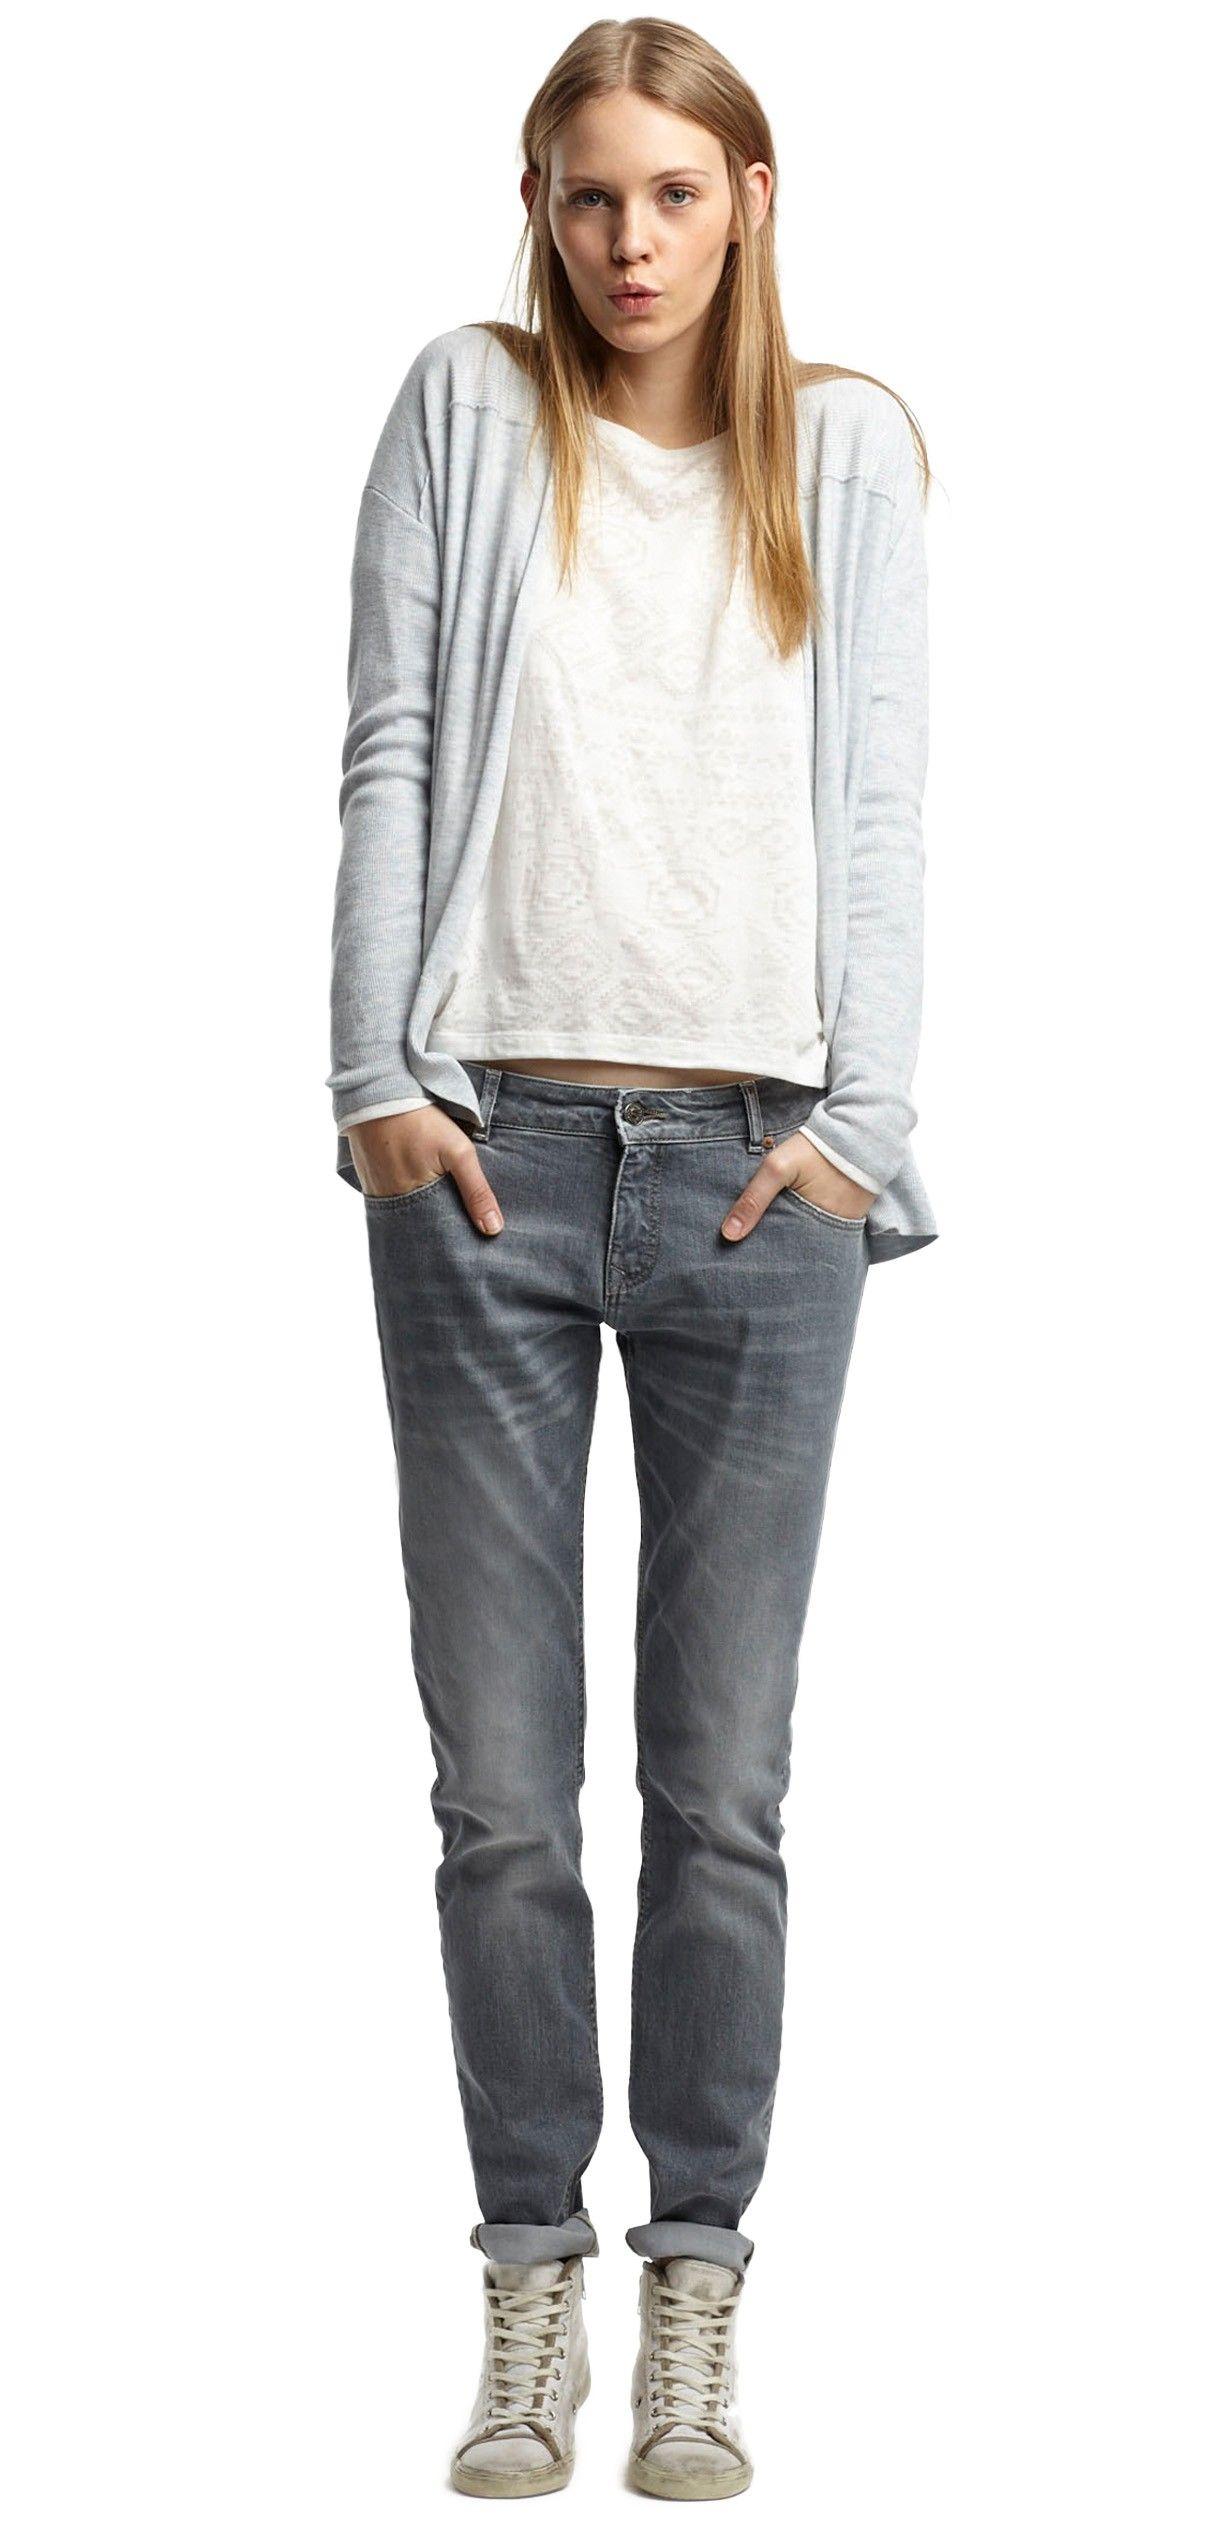 Sufani / Outfits / OPUS Fashion   Kleidung online kaufen ...